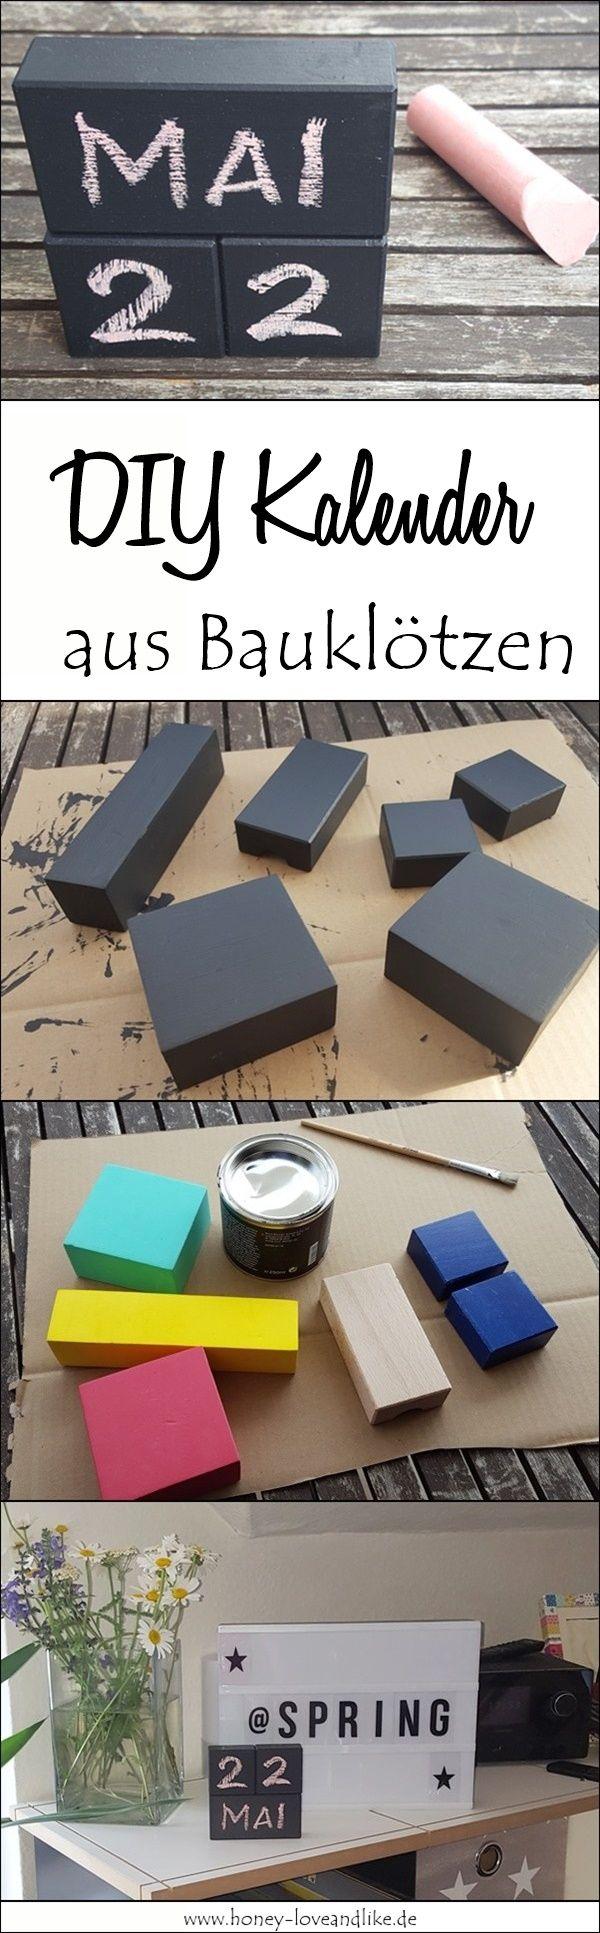 Cooles Upcycling: DIY Kalender mit Tafelfarbe aus alten Bauklötzen basteln